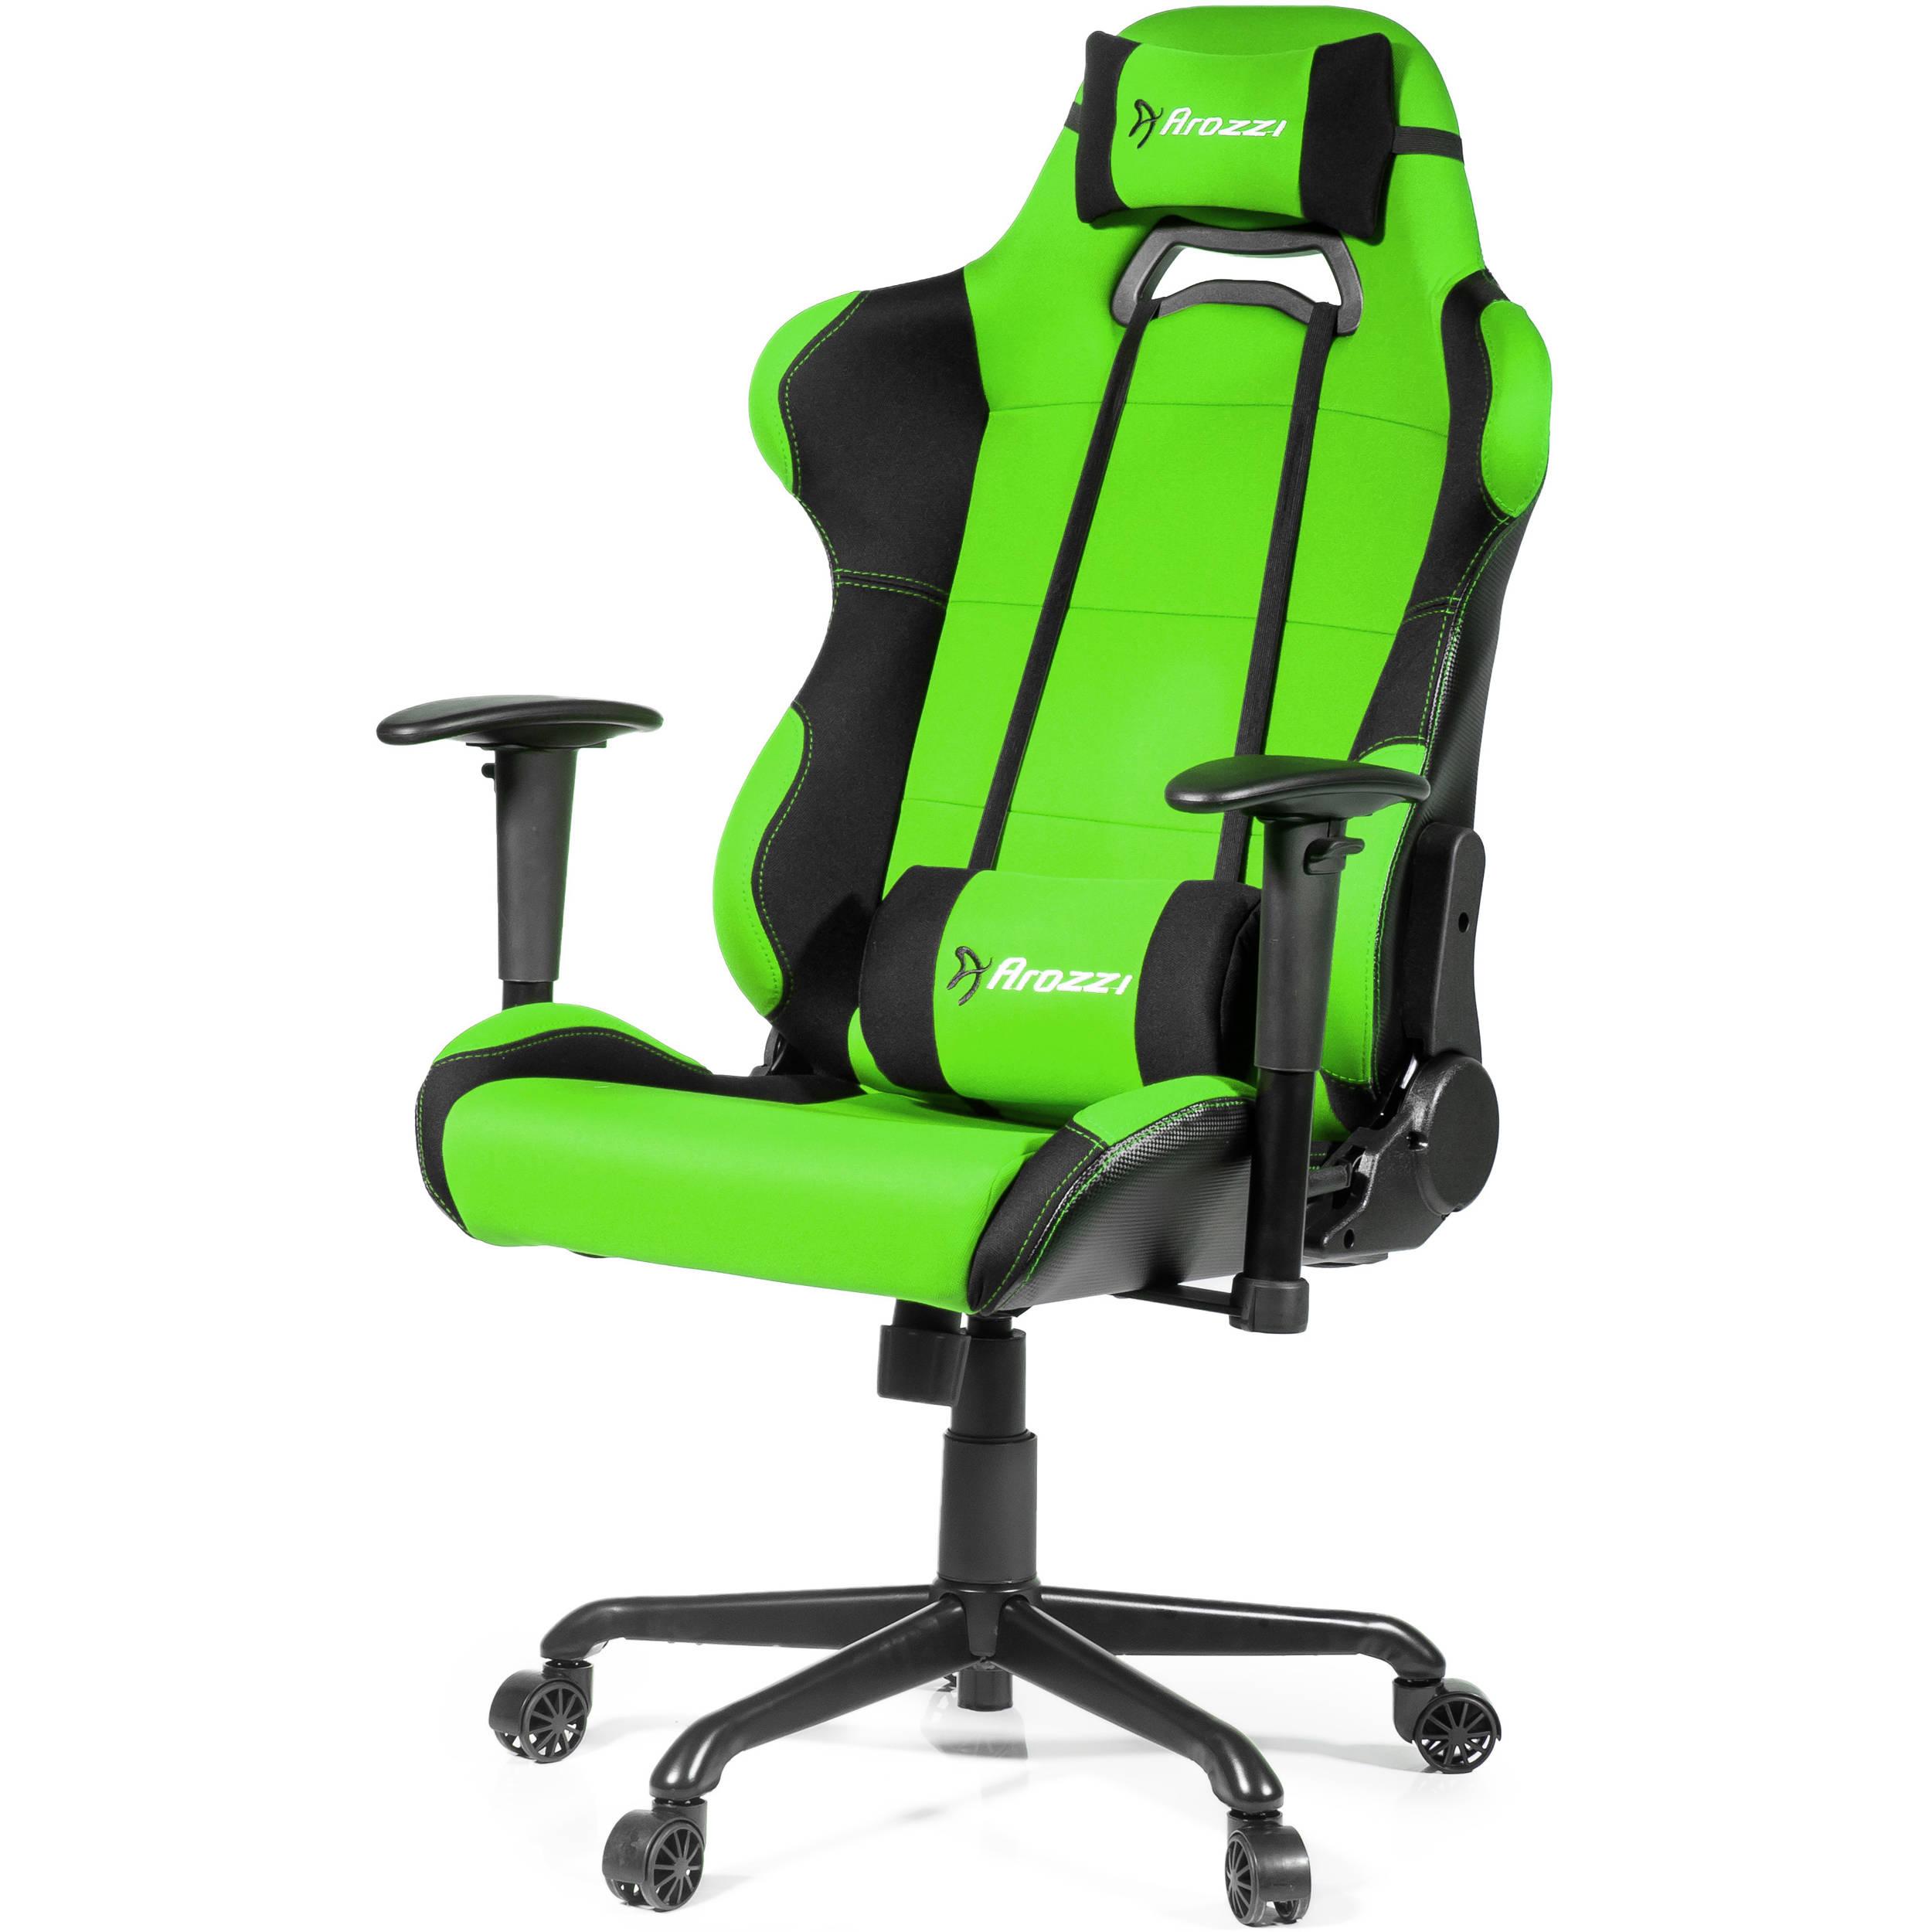 Arozzi Torretta XL Gaming Chair (Green) TORRETTA-XLF-GN B&H